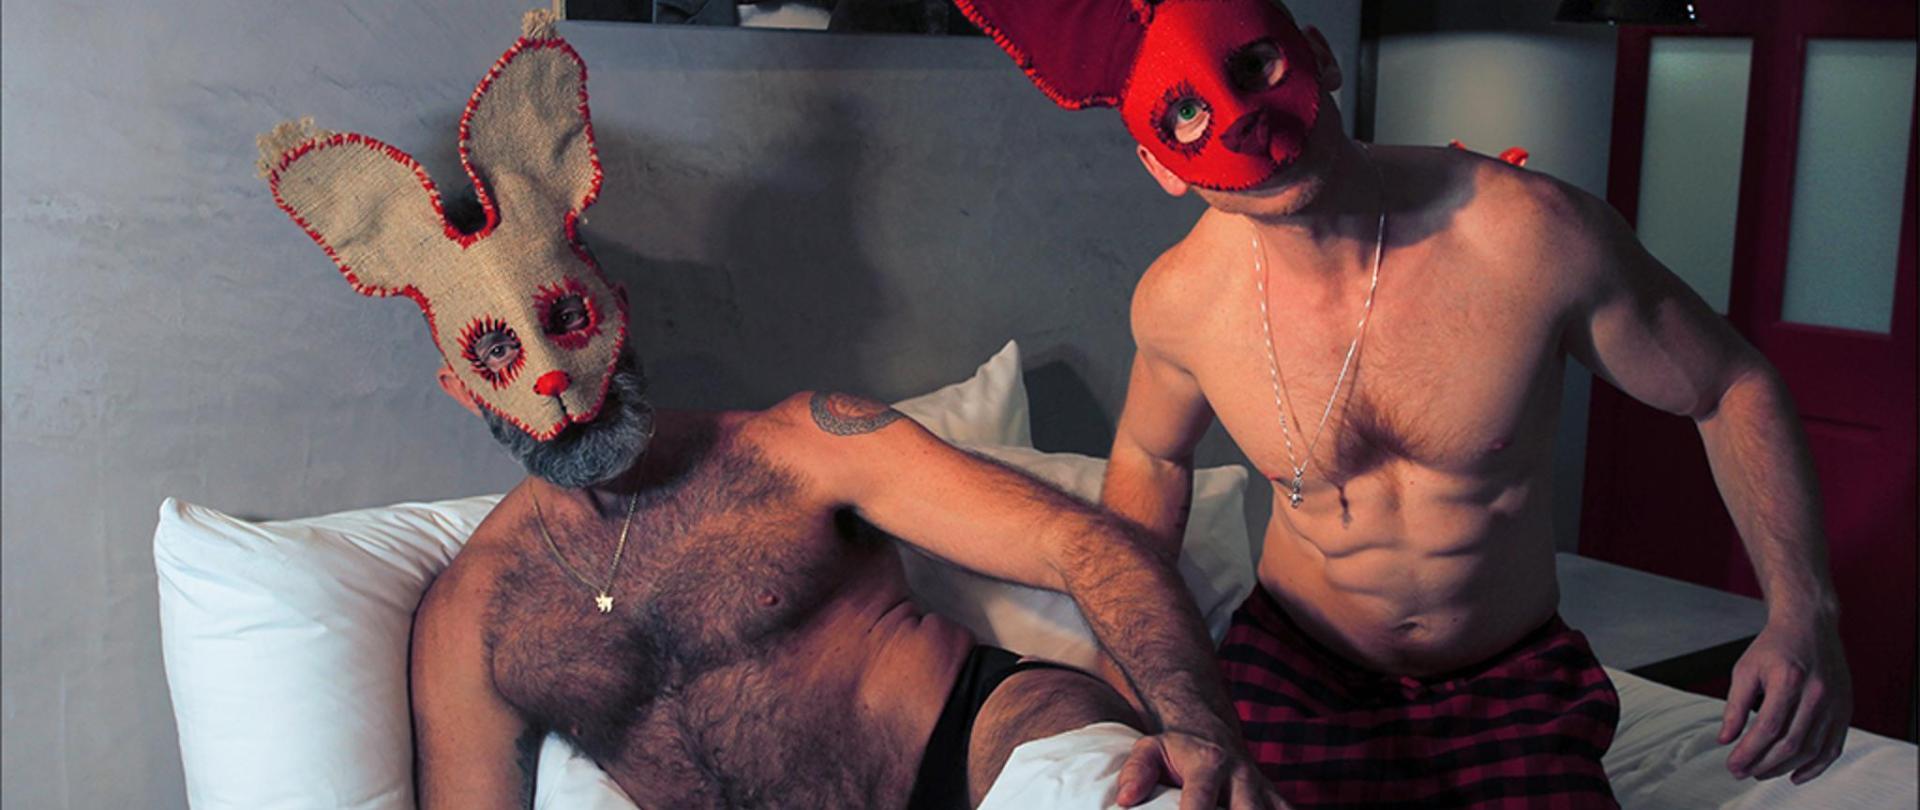 gaythering-daddy-gay-hotel-bar-miami-bear.png